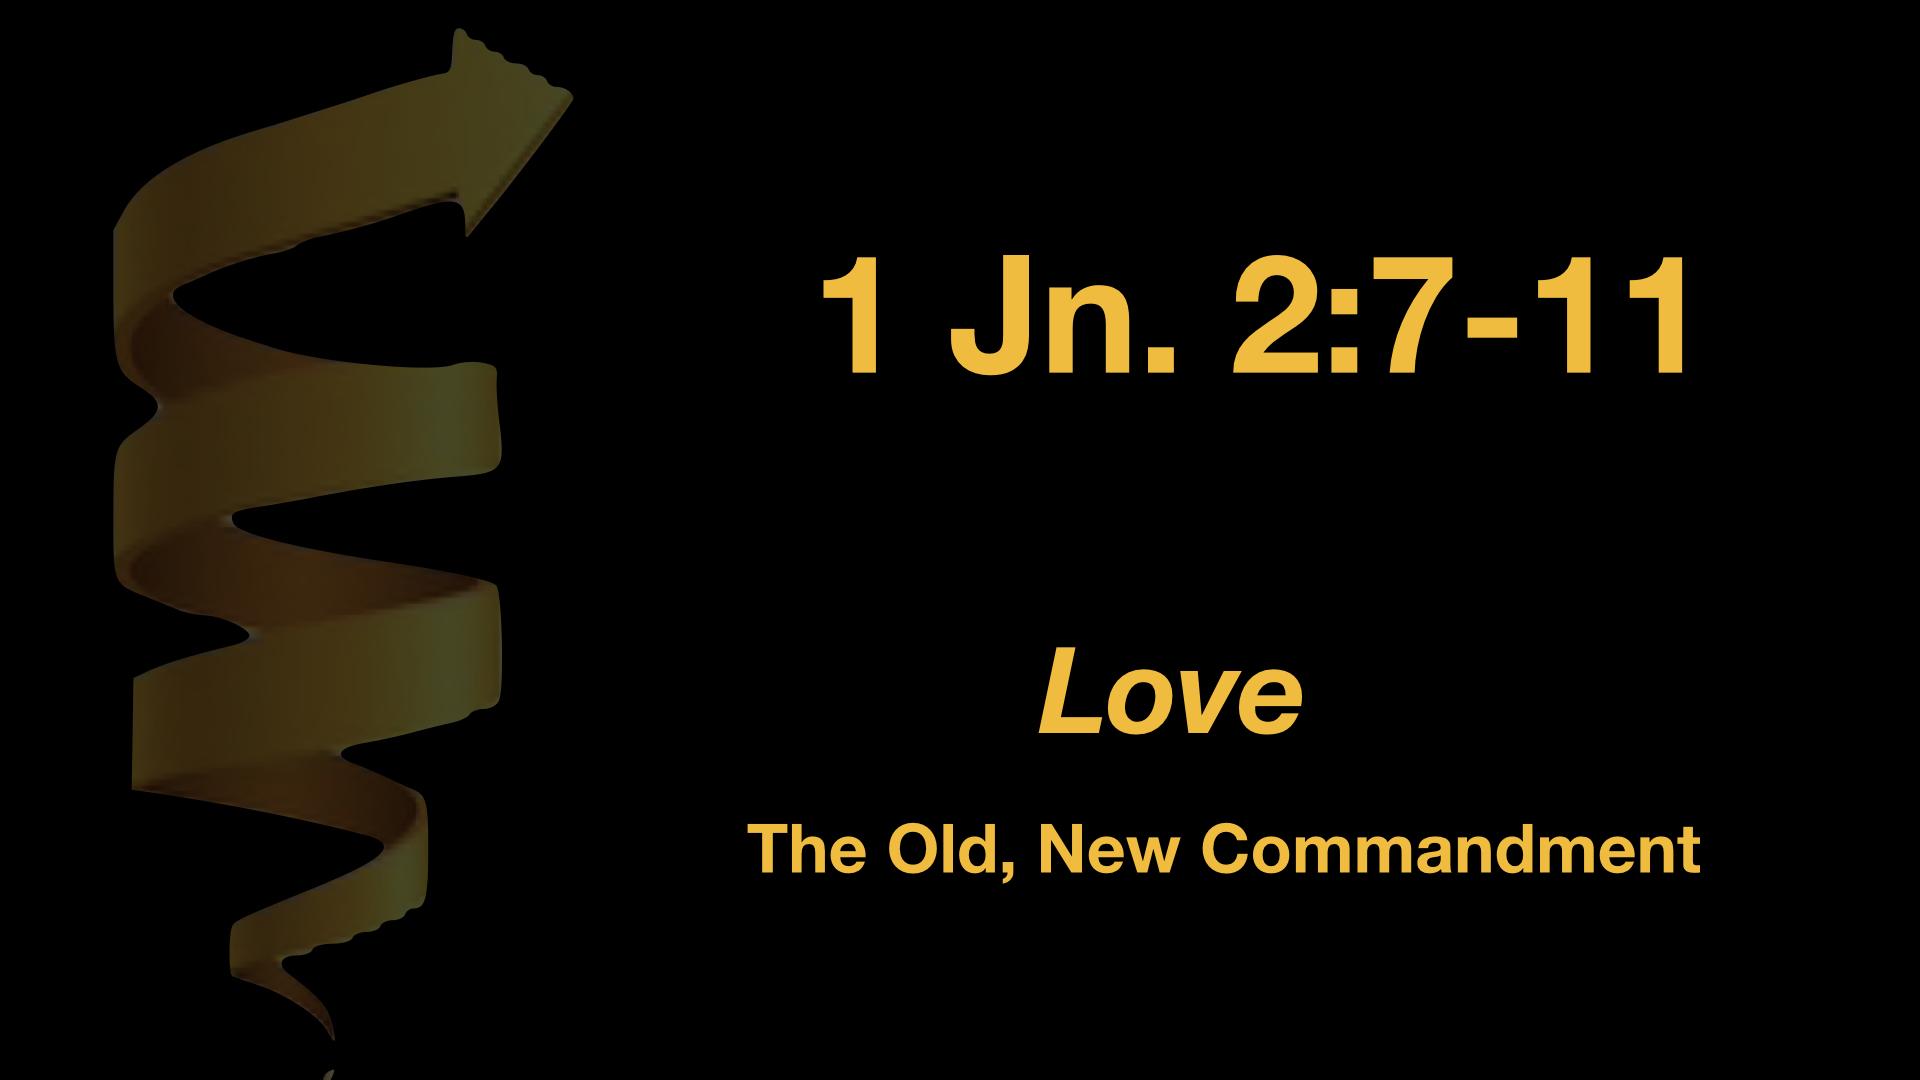 1 John 2;7-11 Love The Old, New Commandment WIDE.001.jpeg